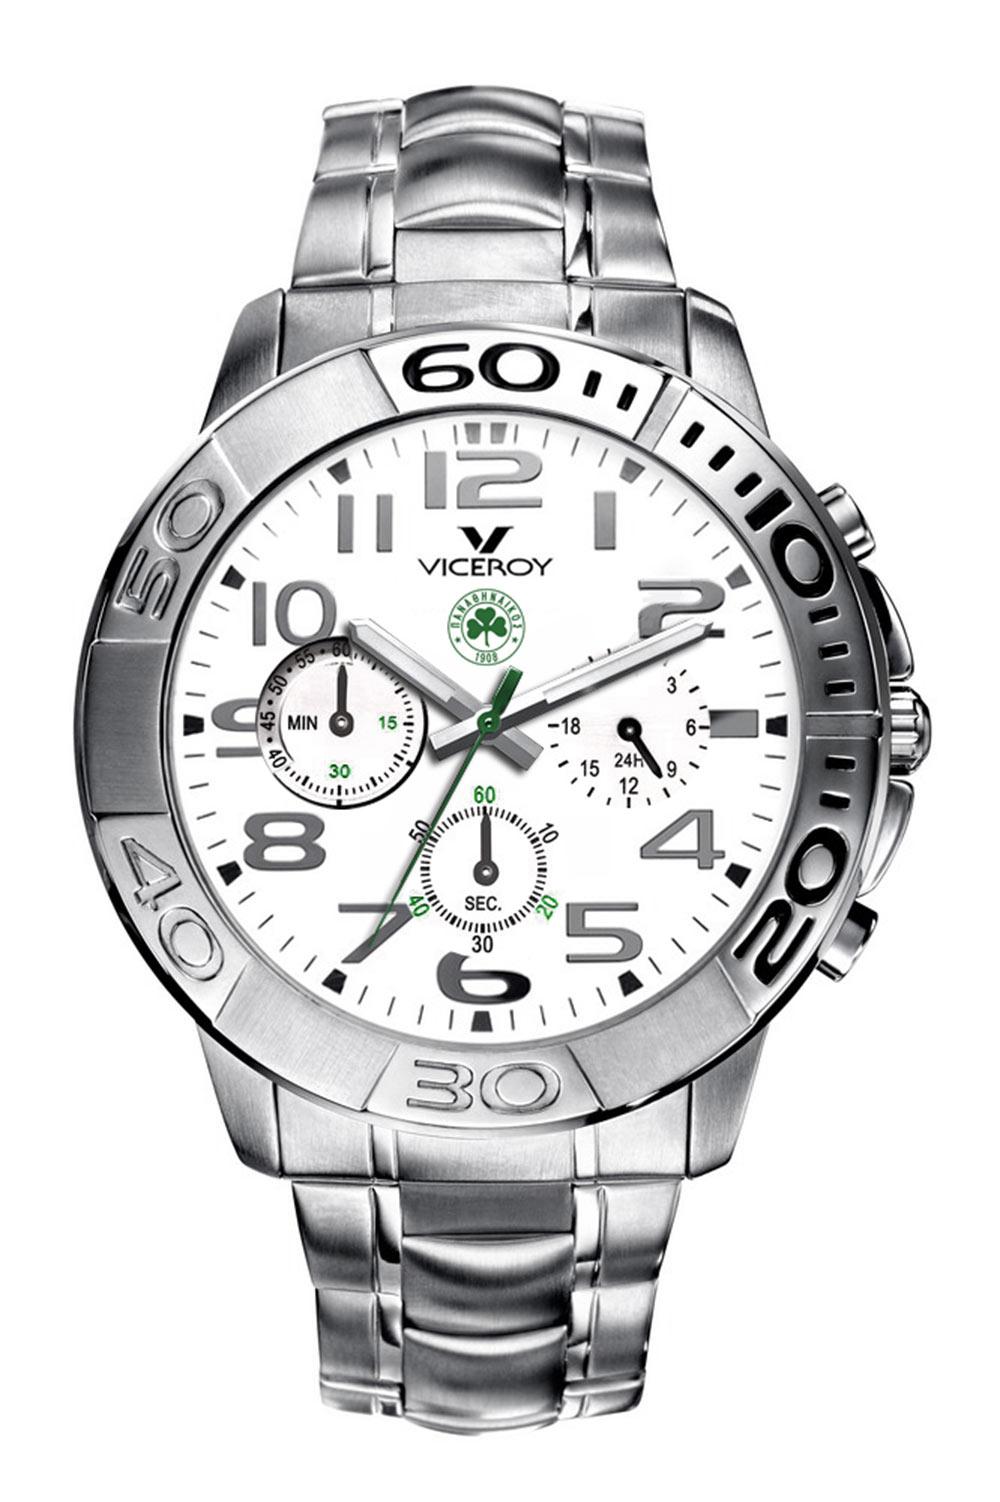 VICEROY PAO B.C PNT3-2 Ανδρικό Ρολόι